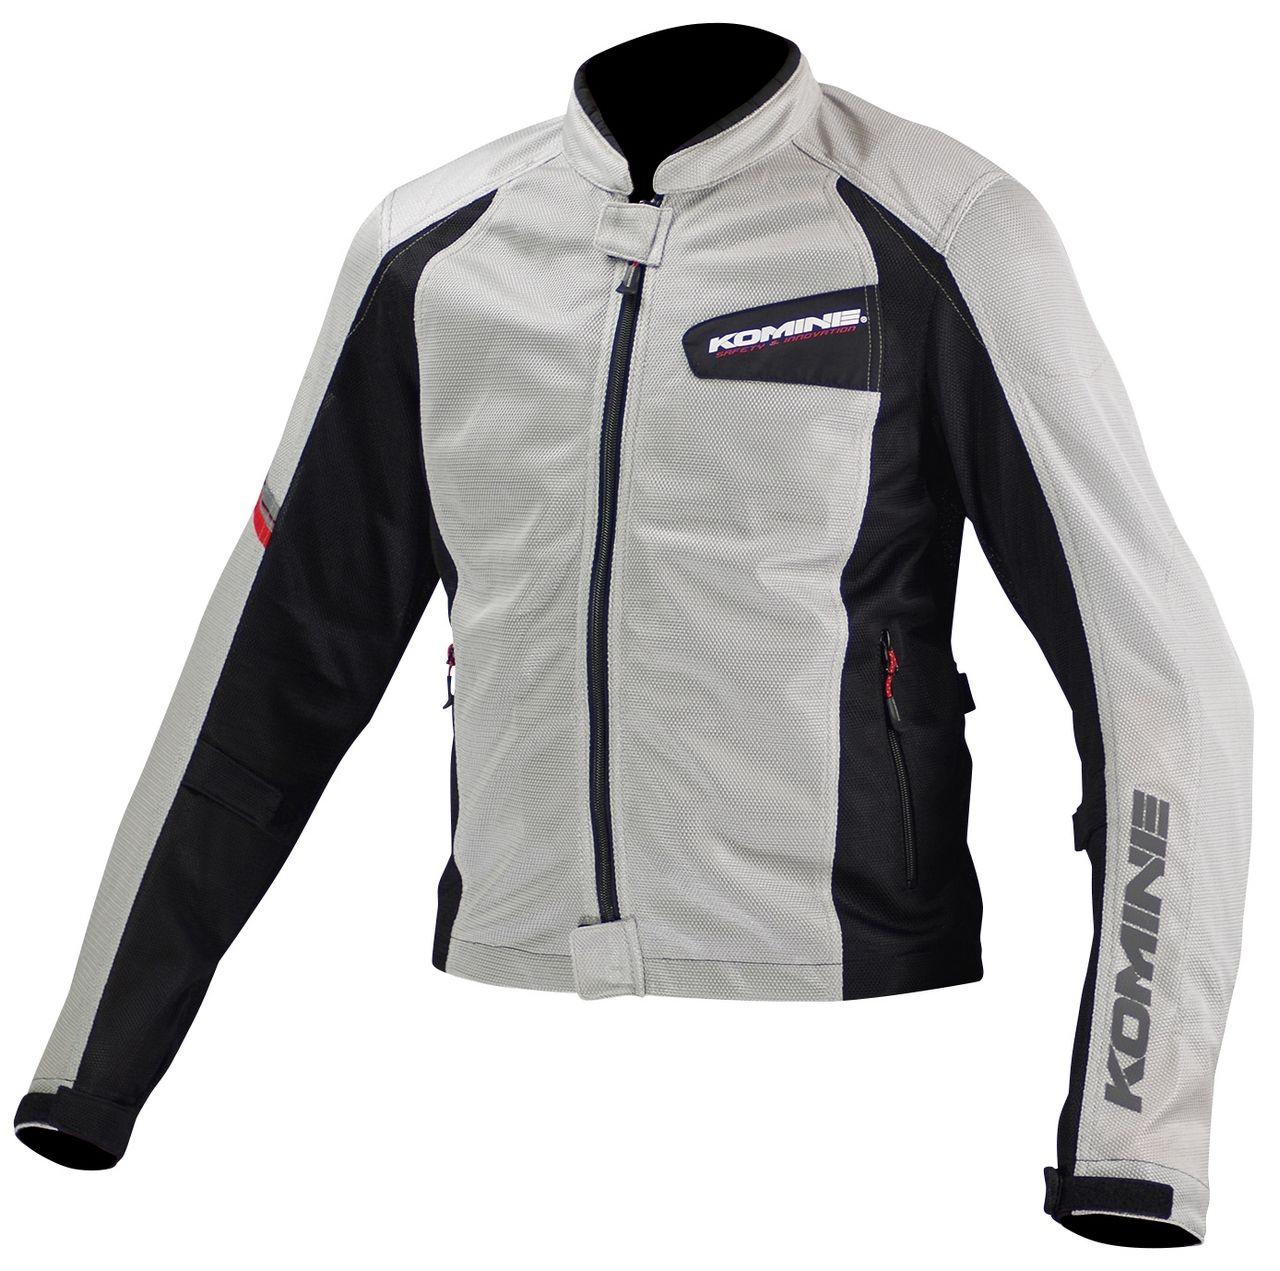 KOMINE JK-100 Protect Full Mesh Jacket